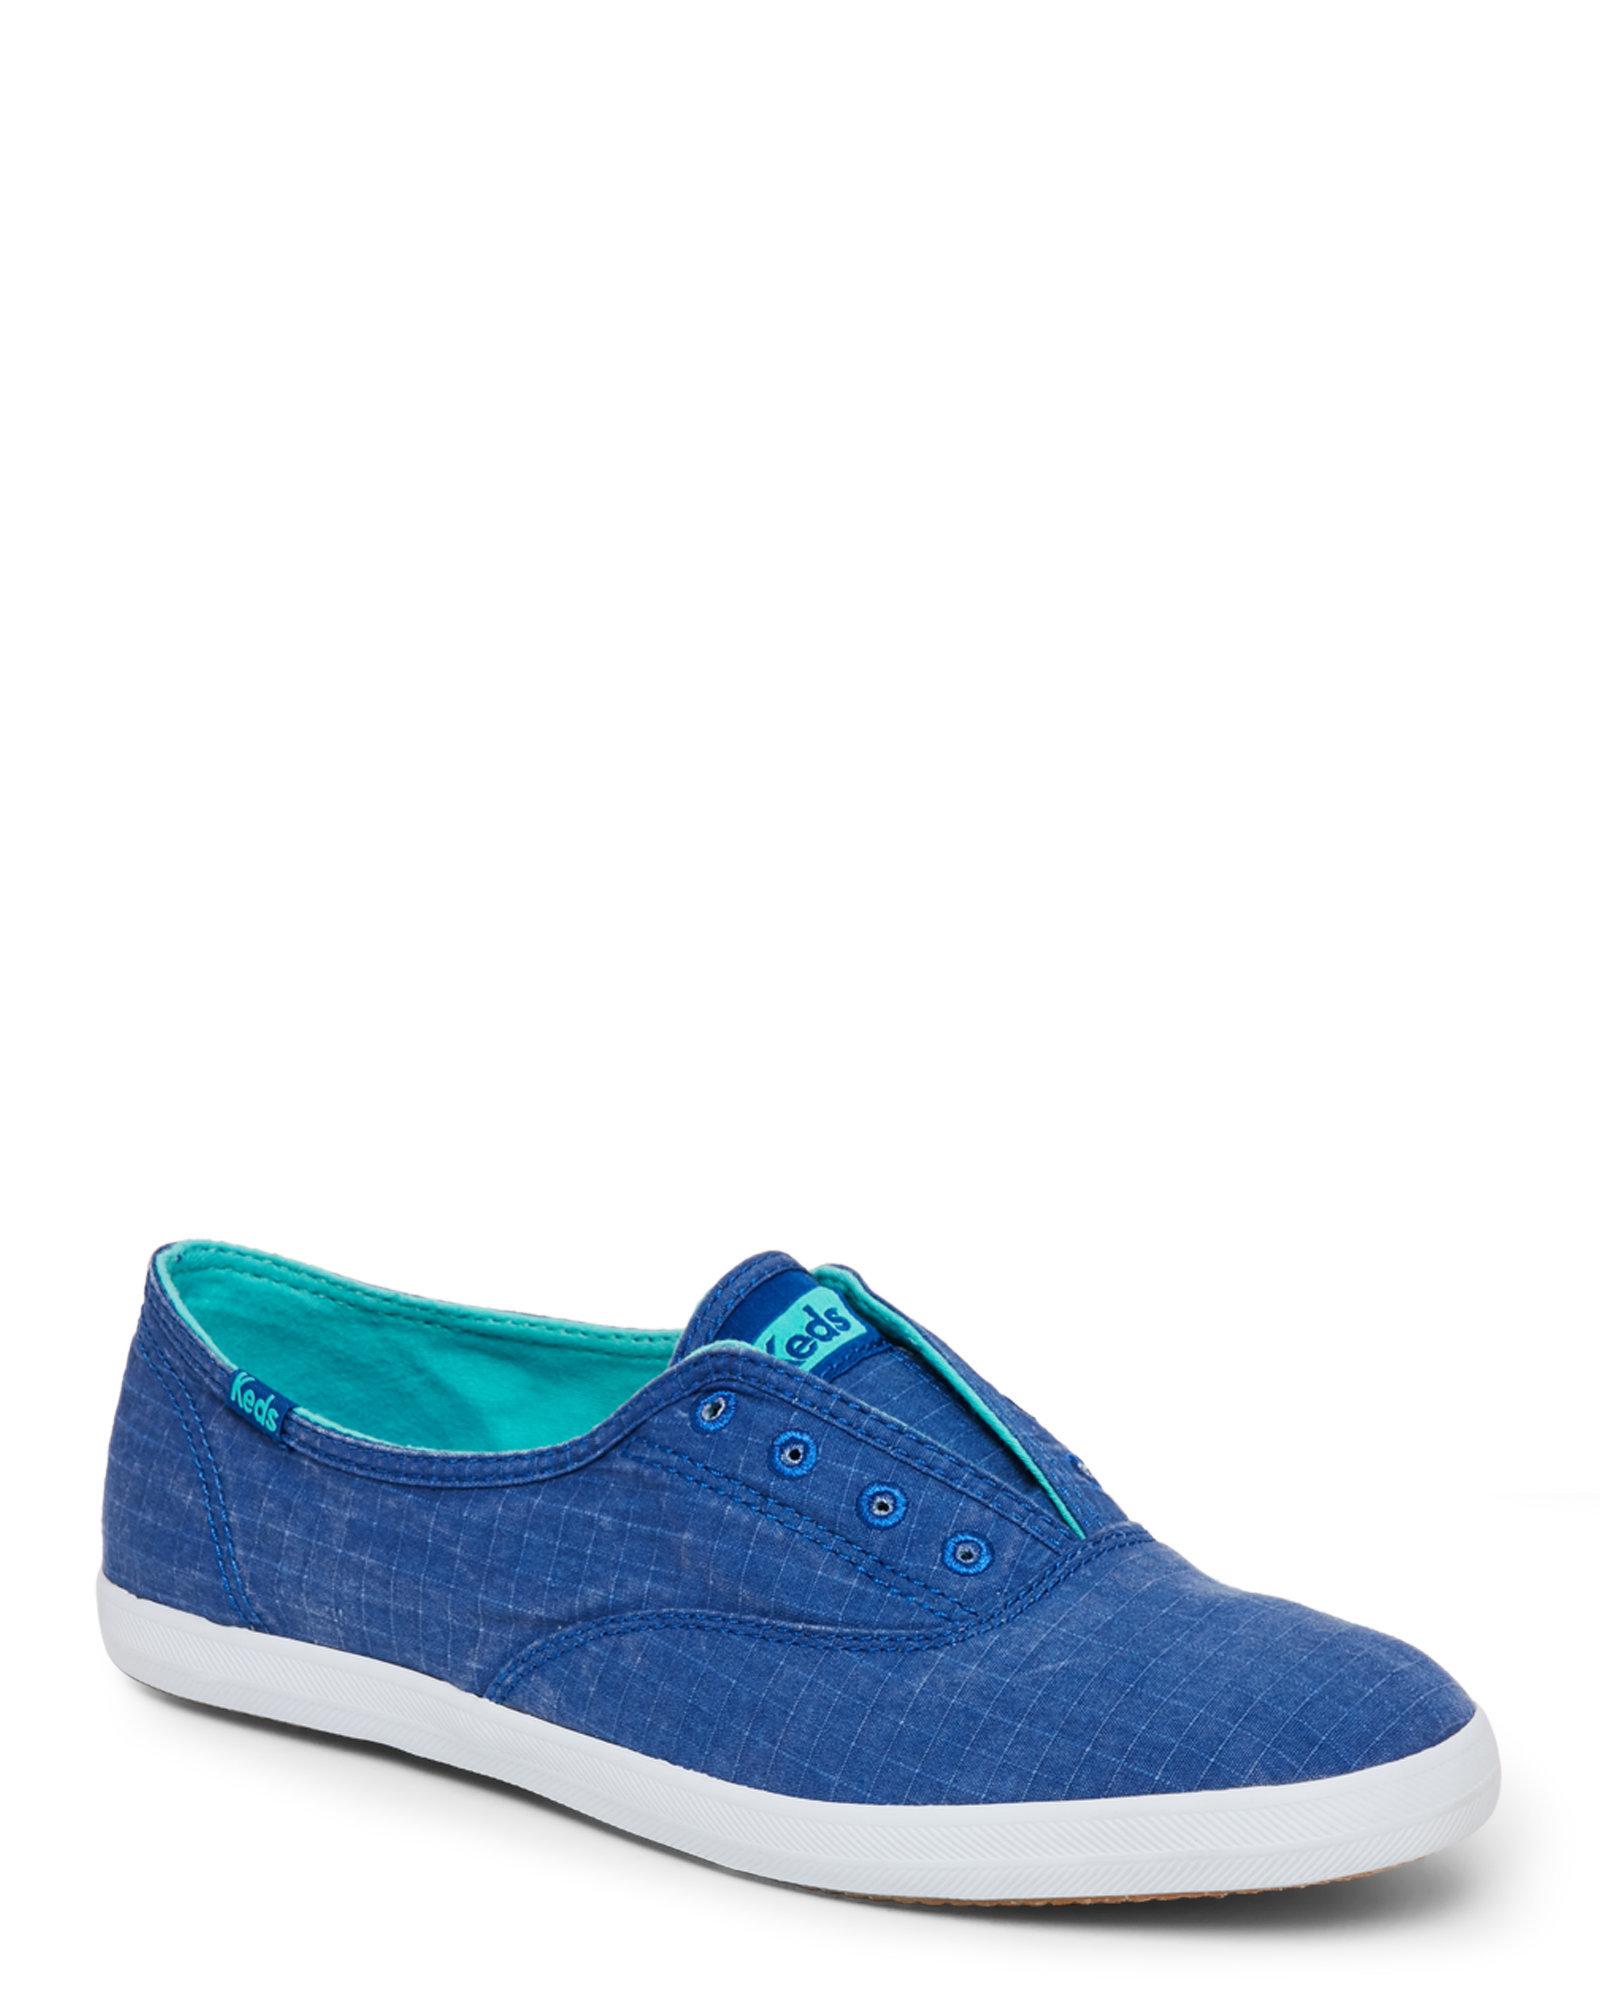 Keds Leather Slip On Shoes